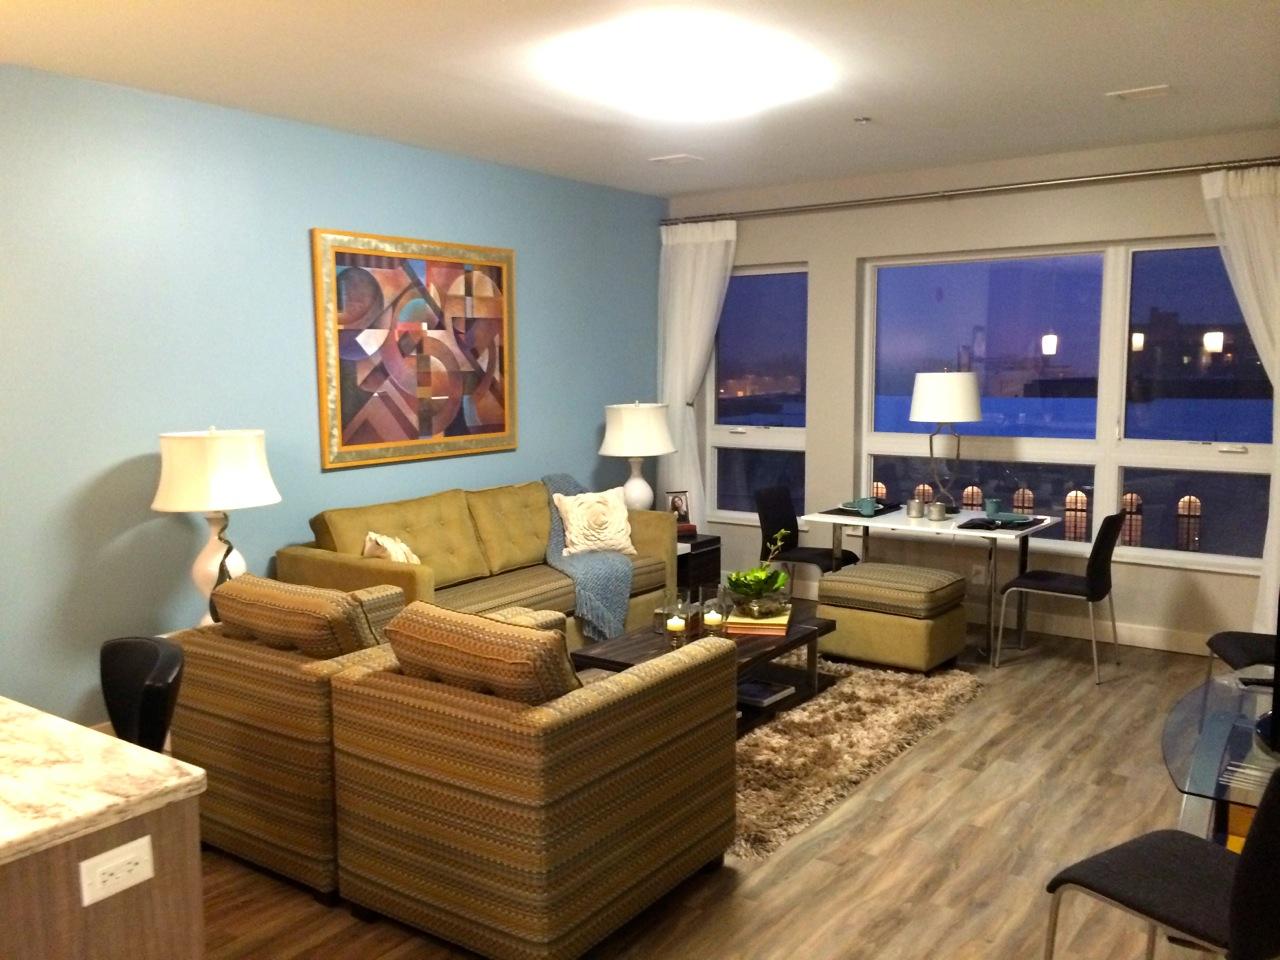 Seneca_Way_Apartments_Ithaca_02141420